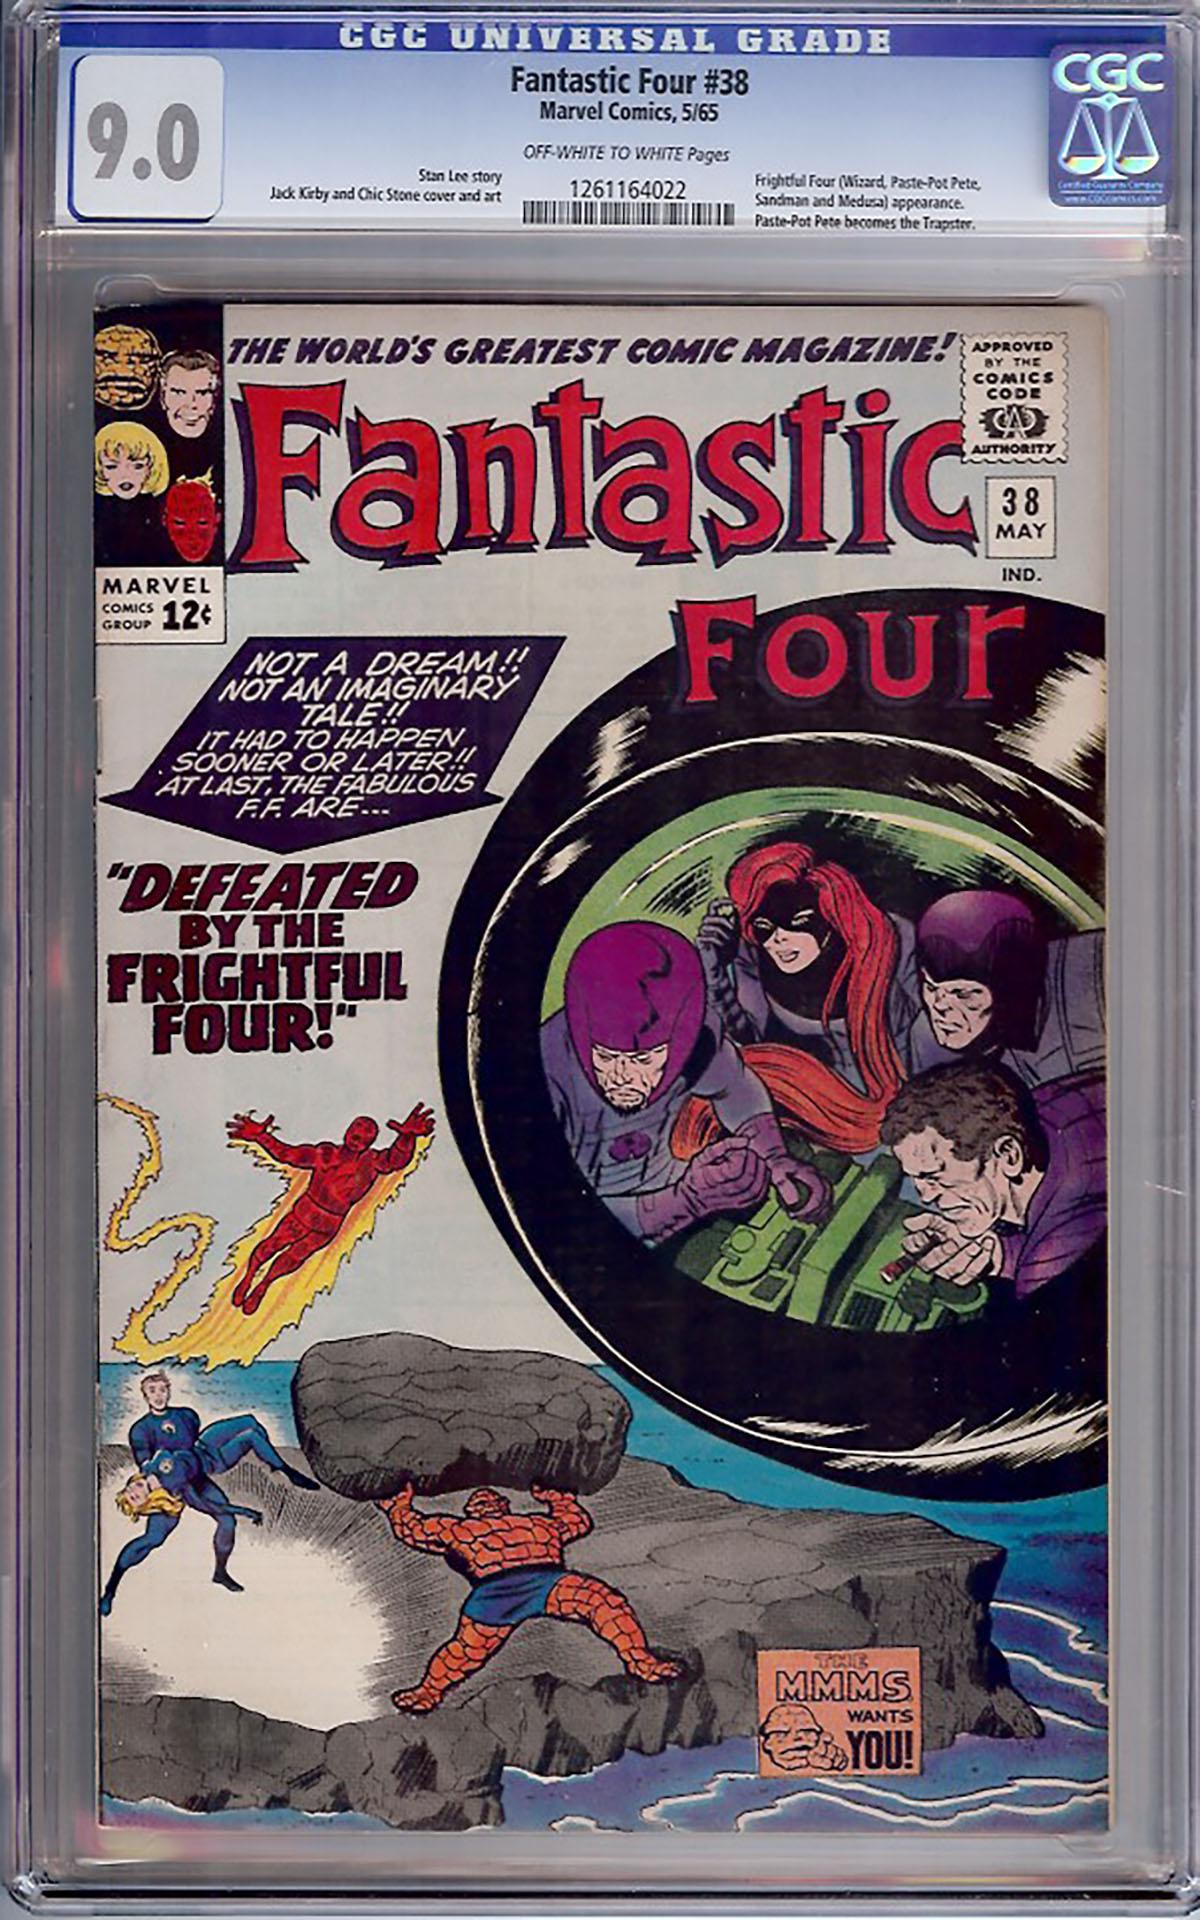 Fantastic Four #38 CGC 9.0 w